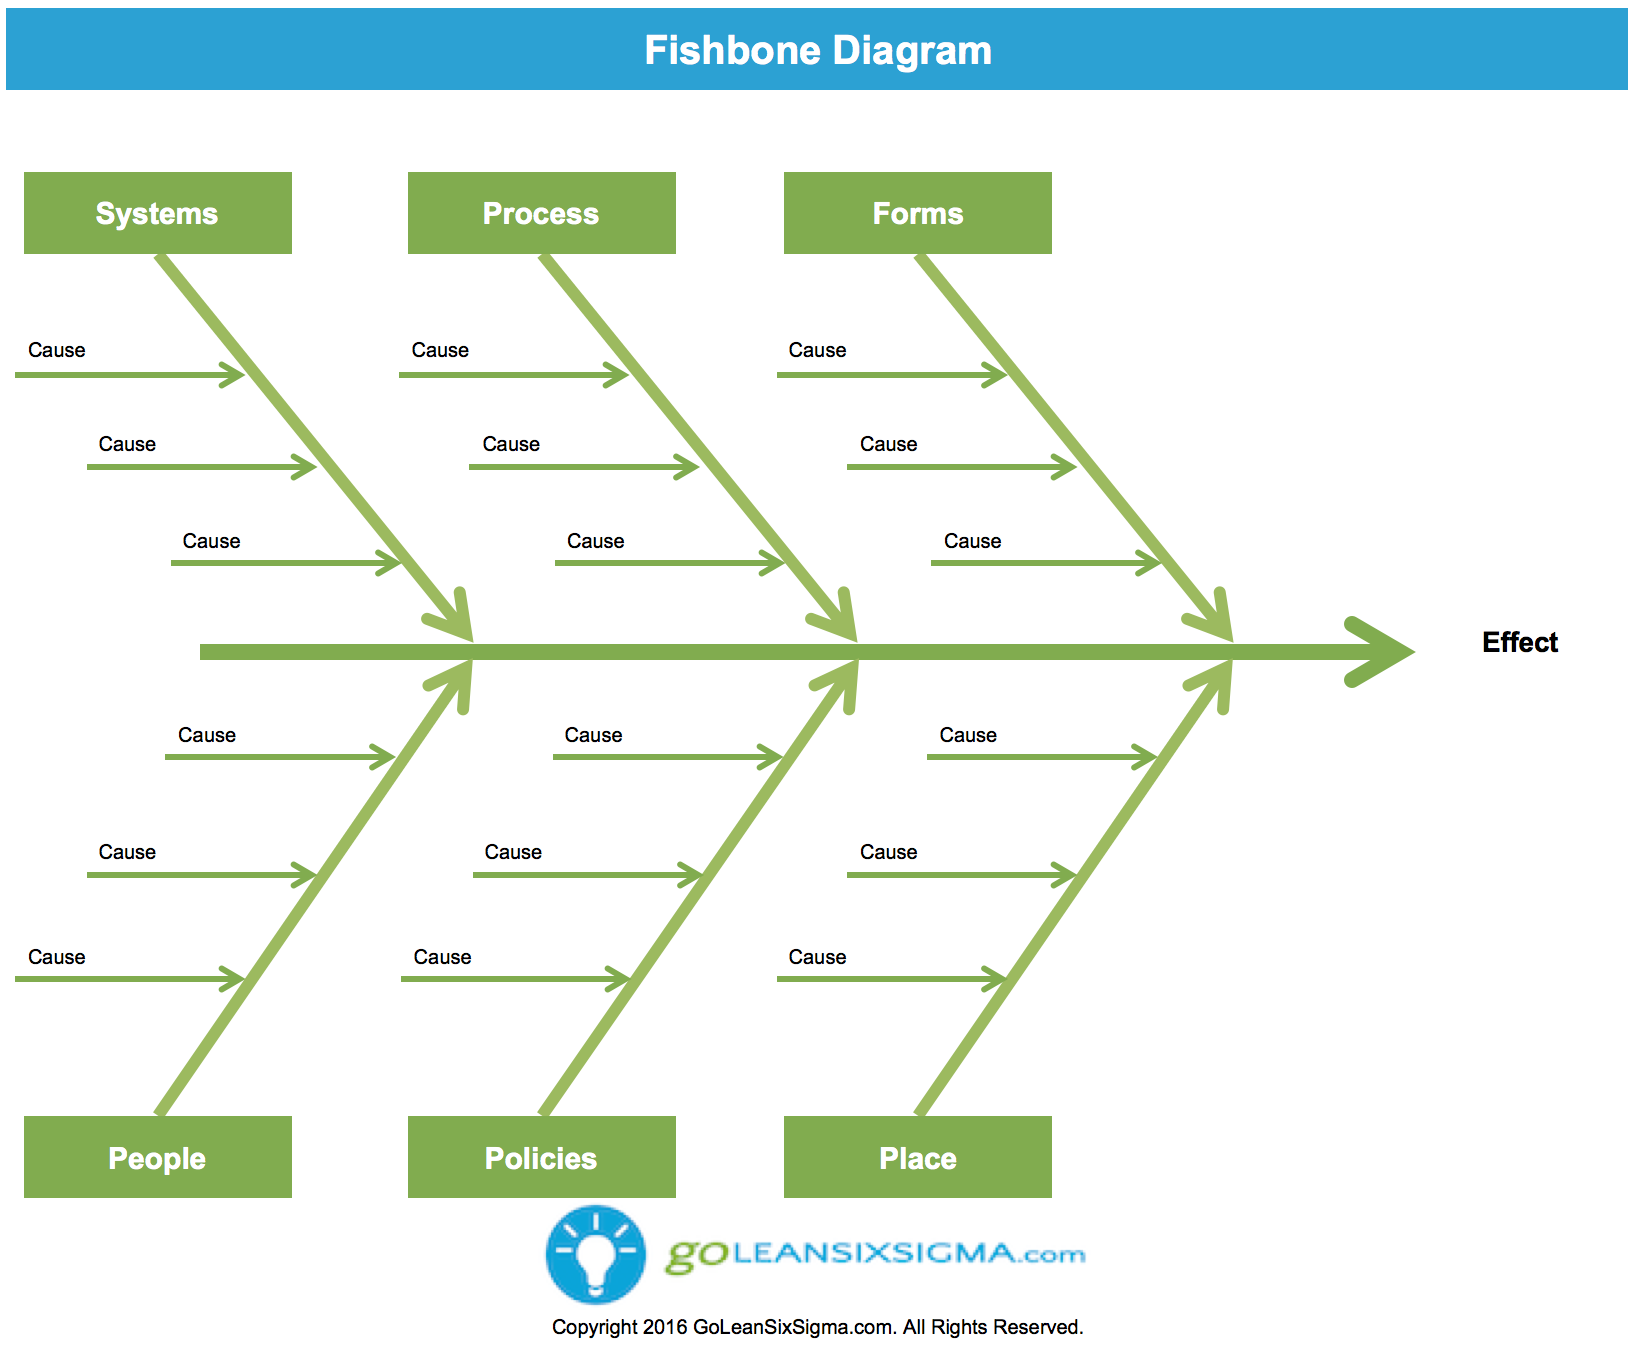 fishbone diagram or cause effect diagram template example [ 1634 x 1350 Pixel ]